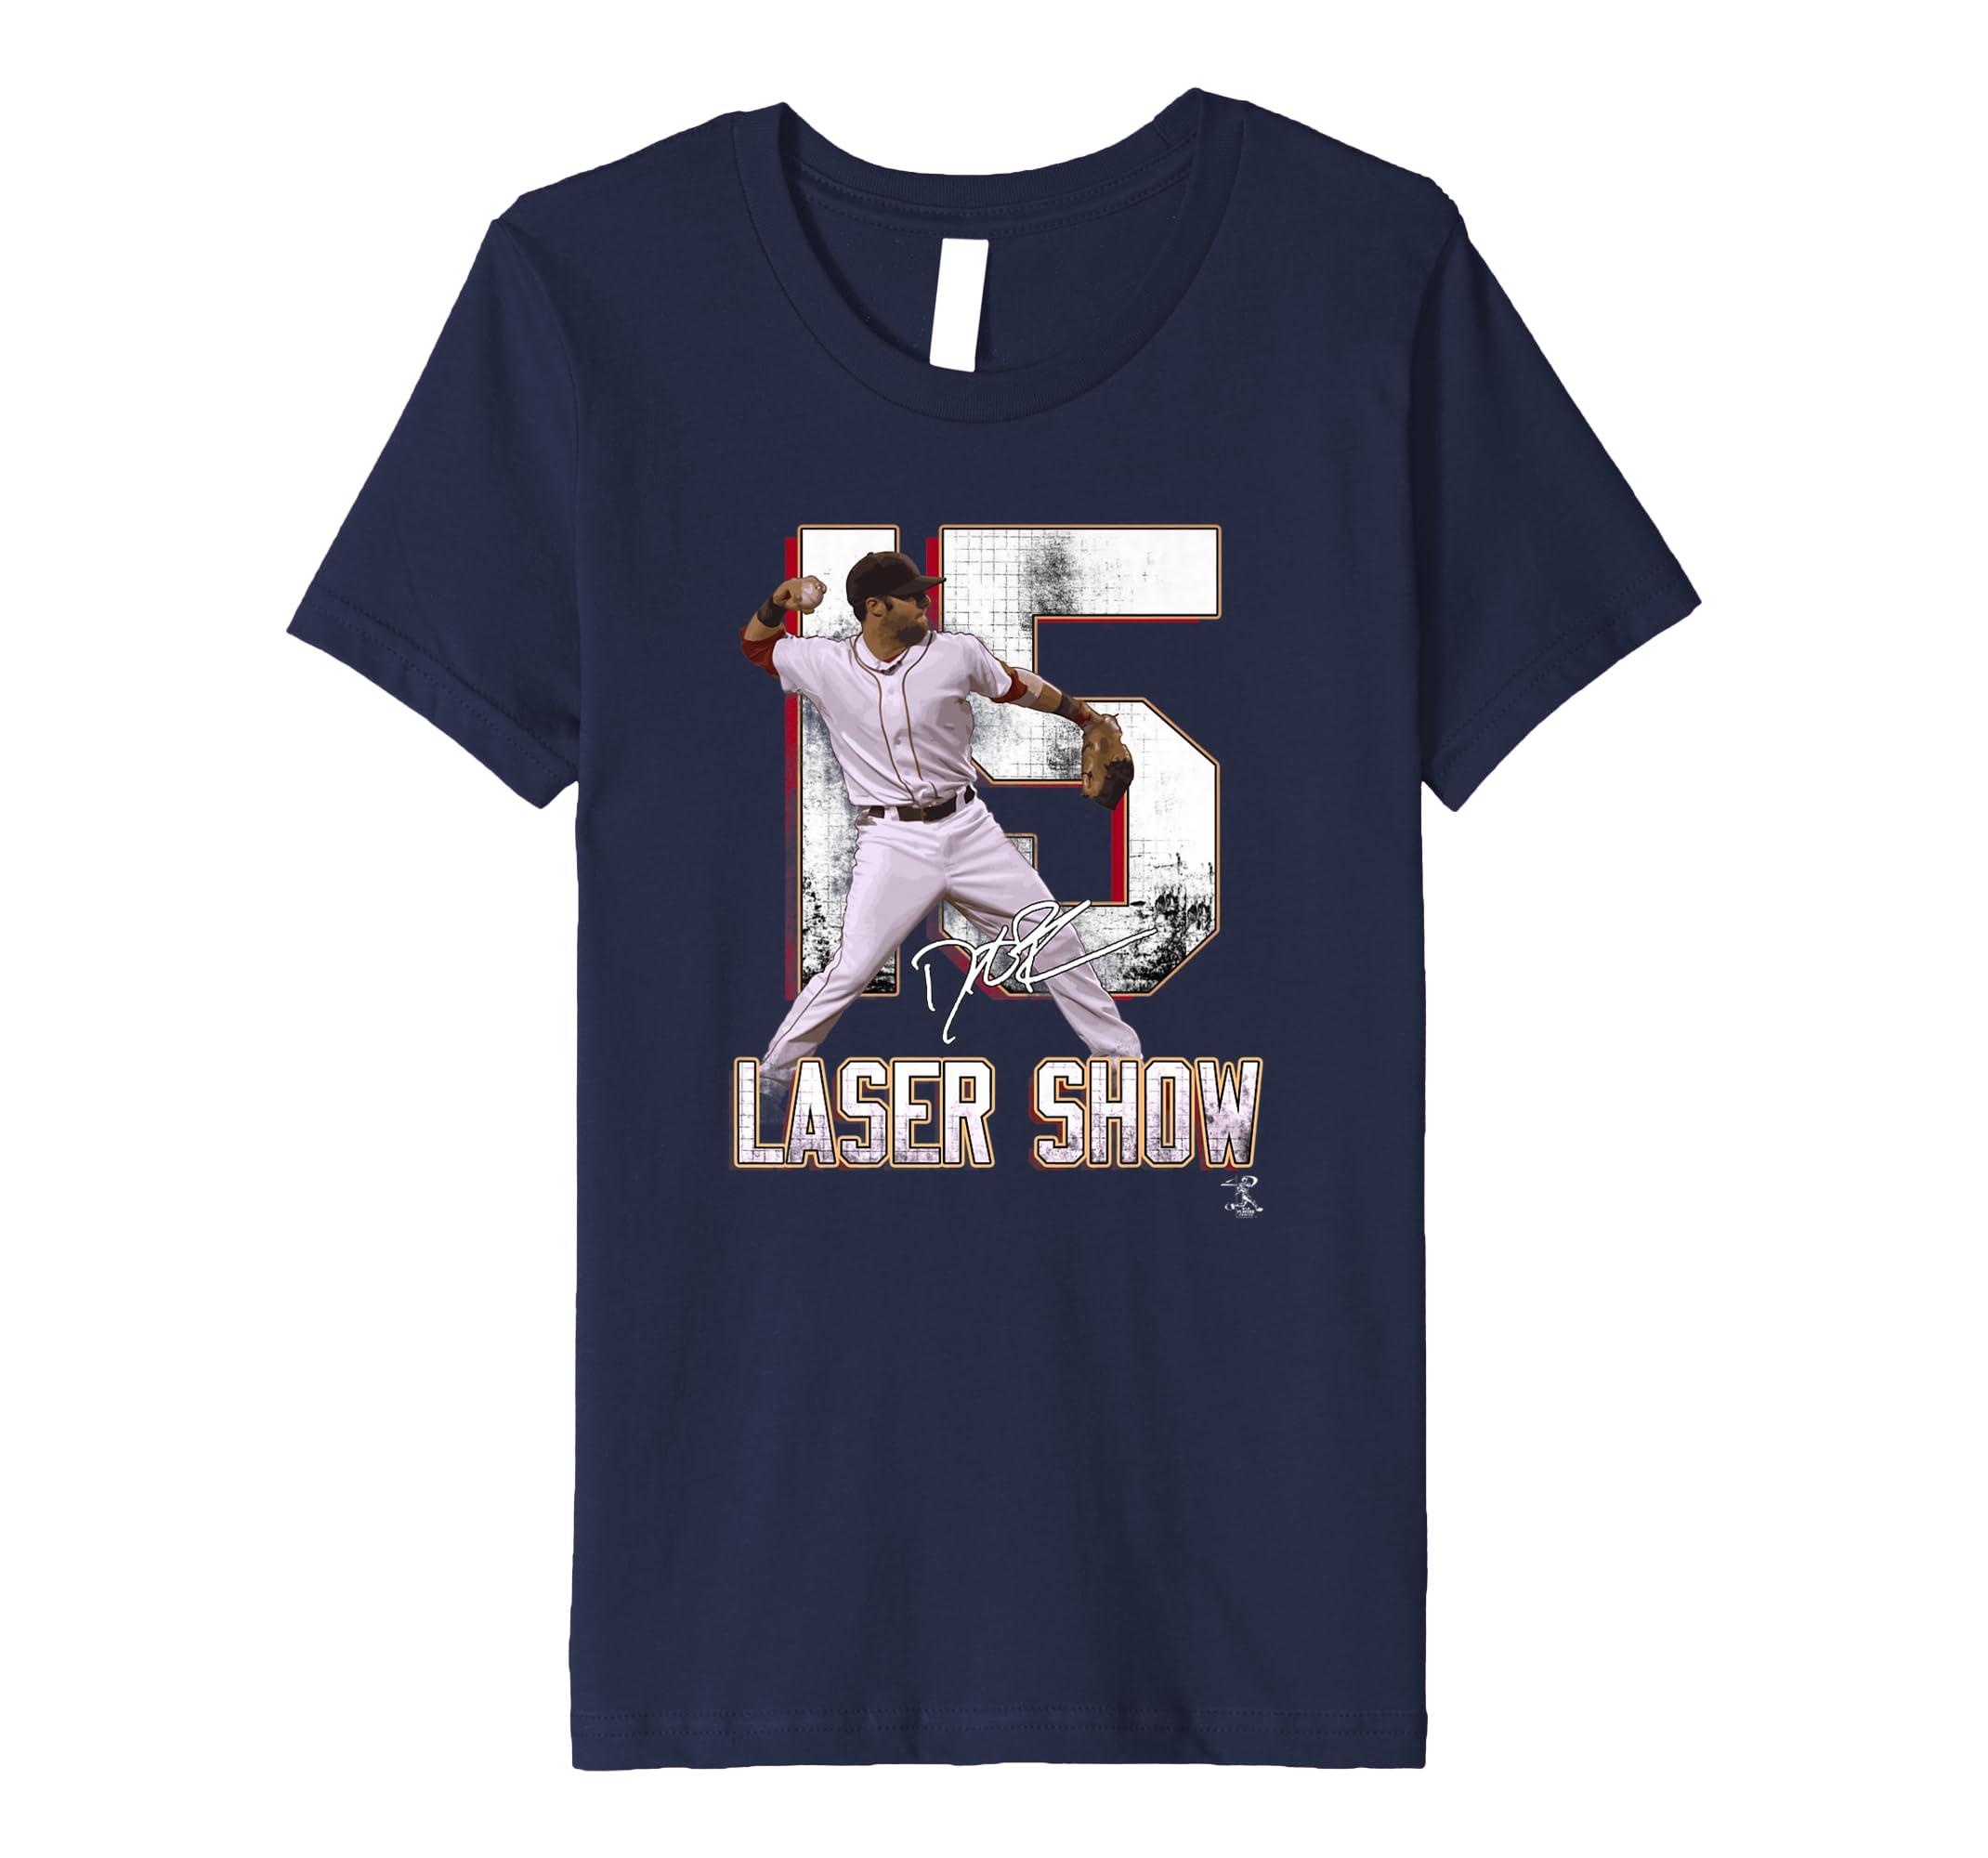 huge discount 7dad7 ea0d3 Amazon.com: Dustin Pedroia T-Shirt - Apparel: Clothing